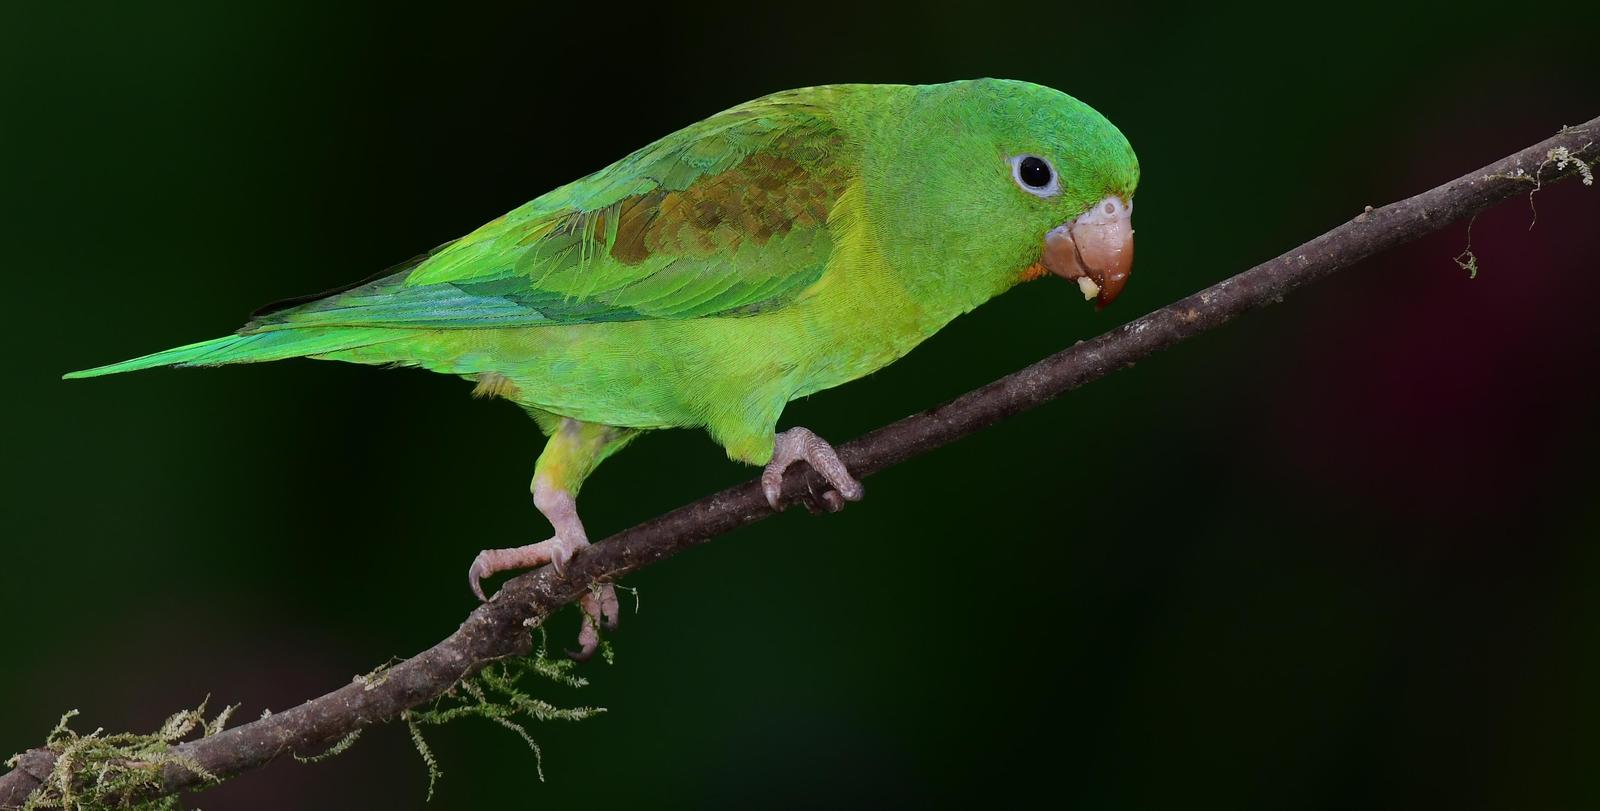 Orange-chinned Parakeet Photo by Gareth Rasberry